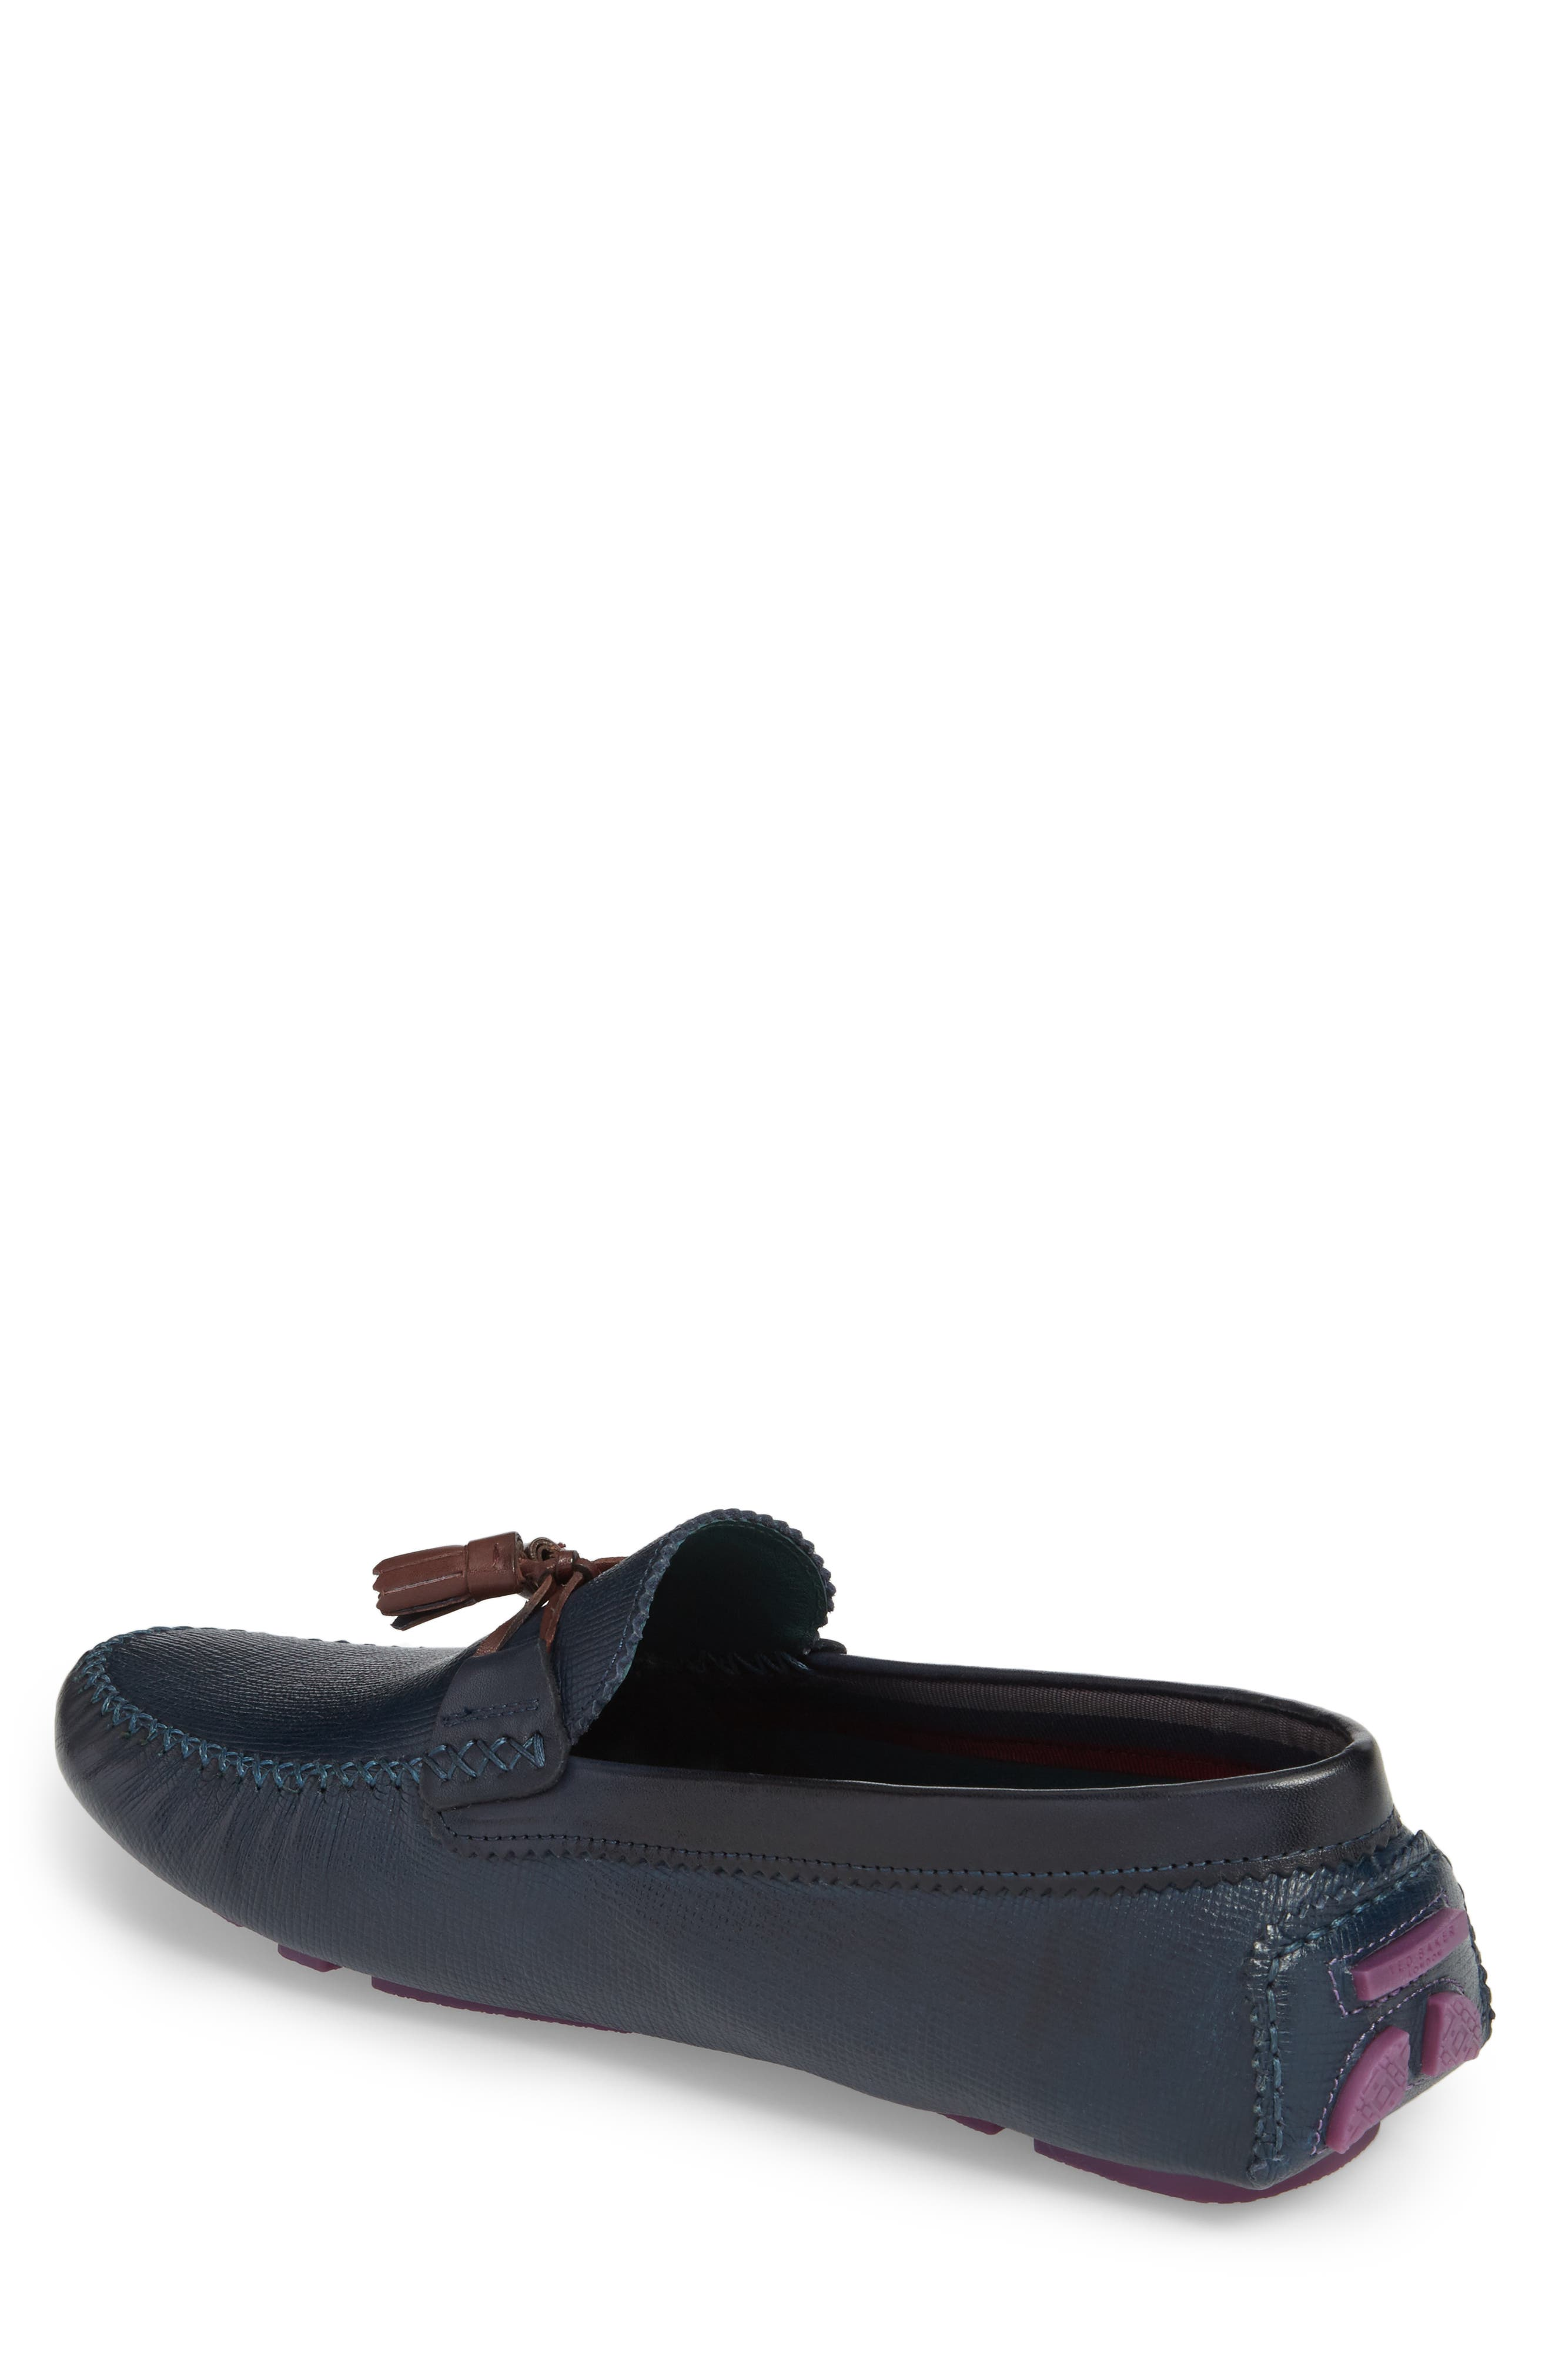 Urbonn Tasseled Driving Loafer,                             Alternate thumbnail 2, color,                             Dark Blue Leather